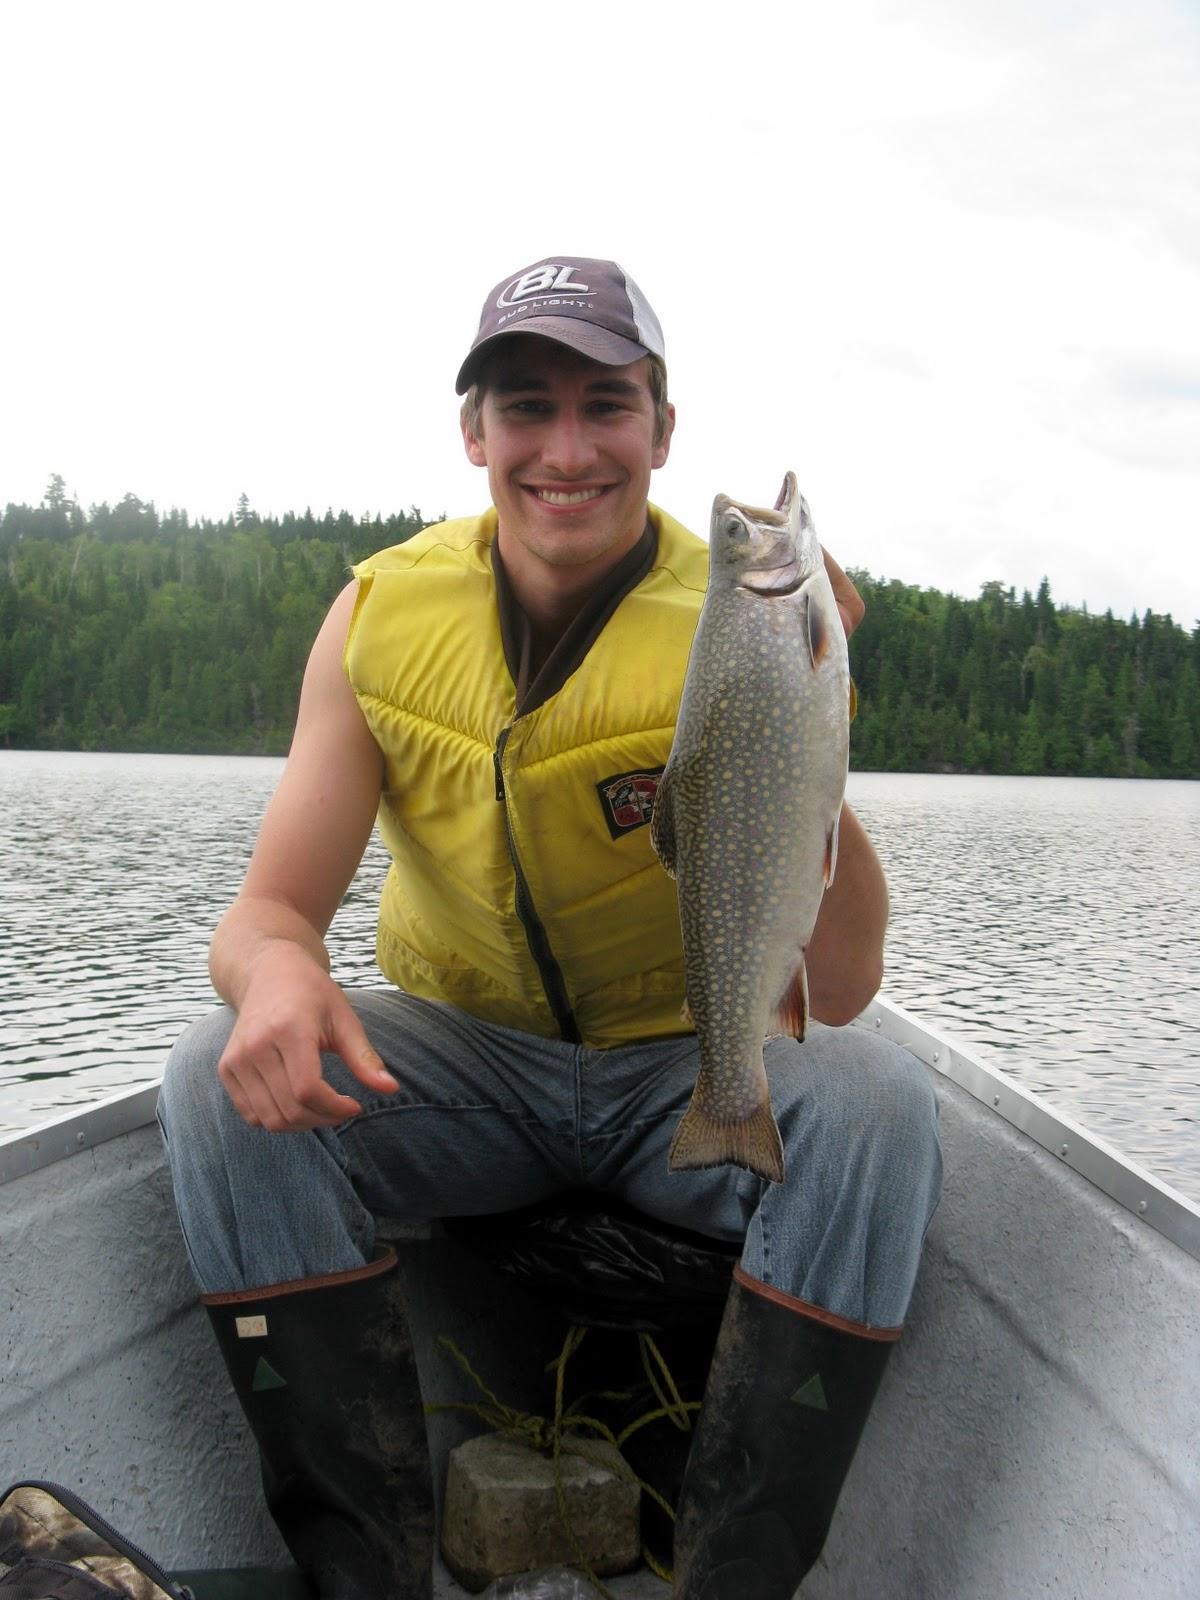 La pêche sibir la photo de vidéo